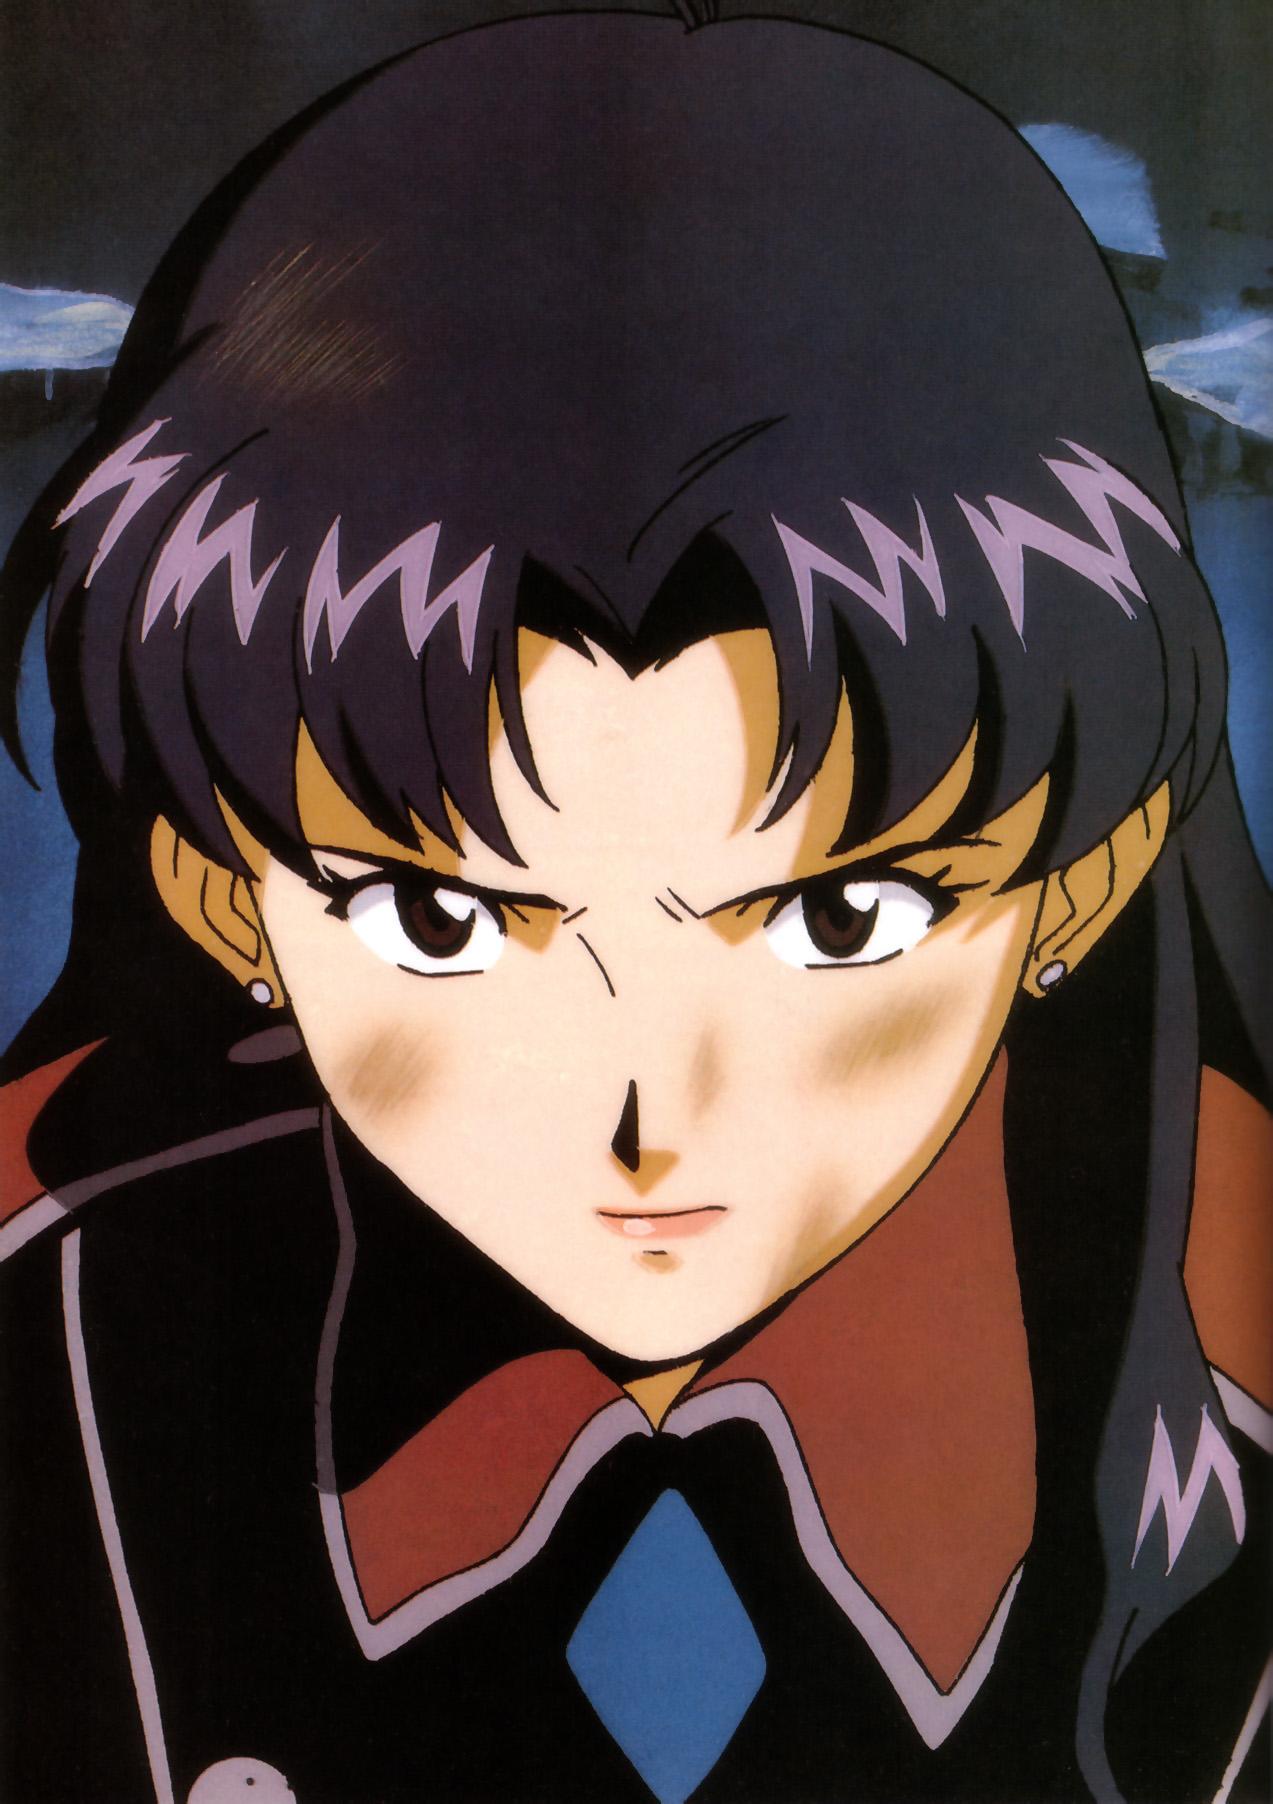 Anime 1273x1804 Katsuragi Misato Neon Genesis Evangelion women